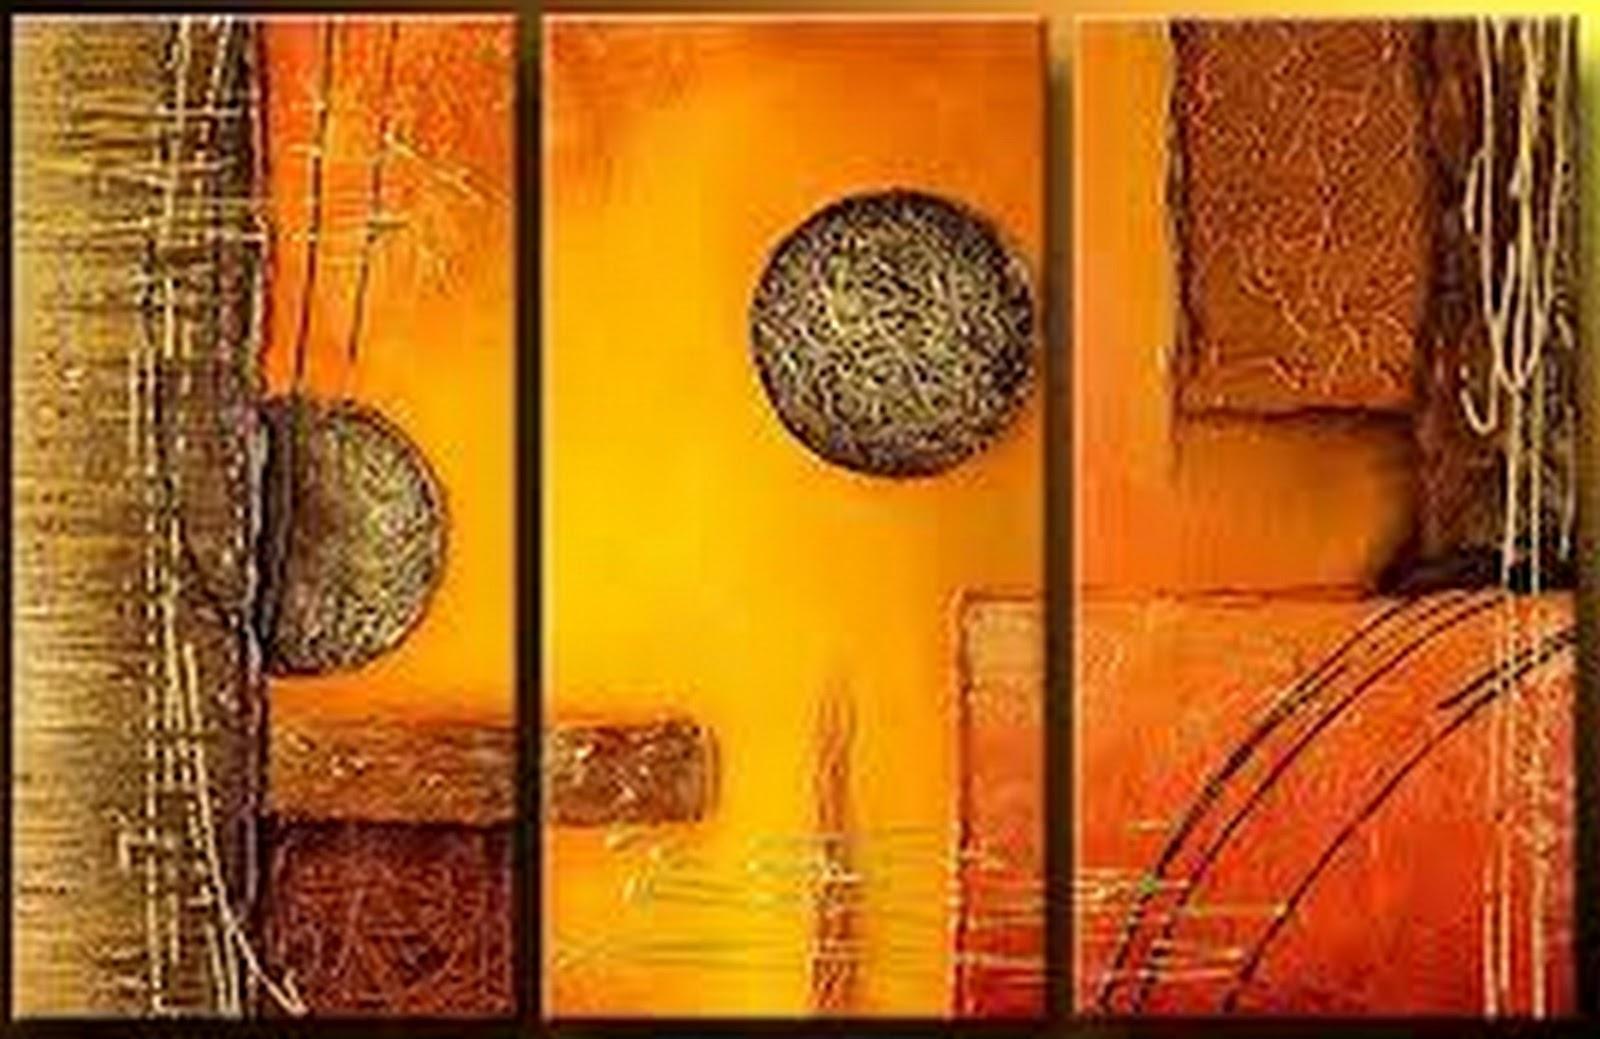 Pinturas cuadros lienzos cuadros abstractos modernos for Imagenes de cuadros abstractos con texturas